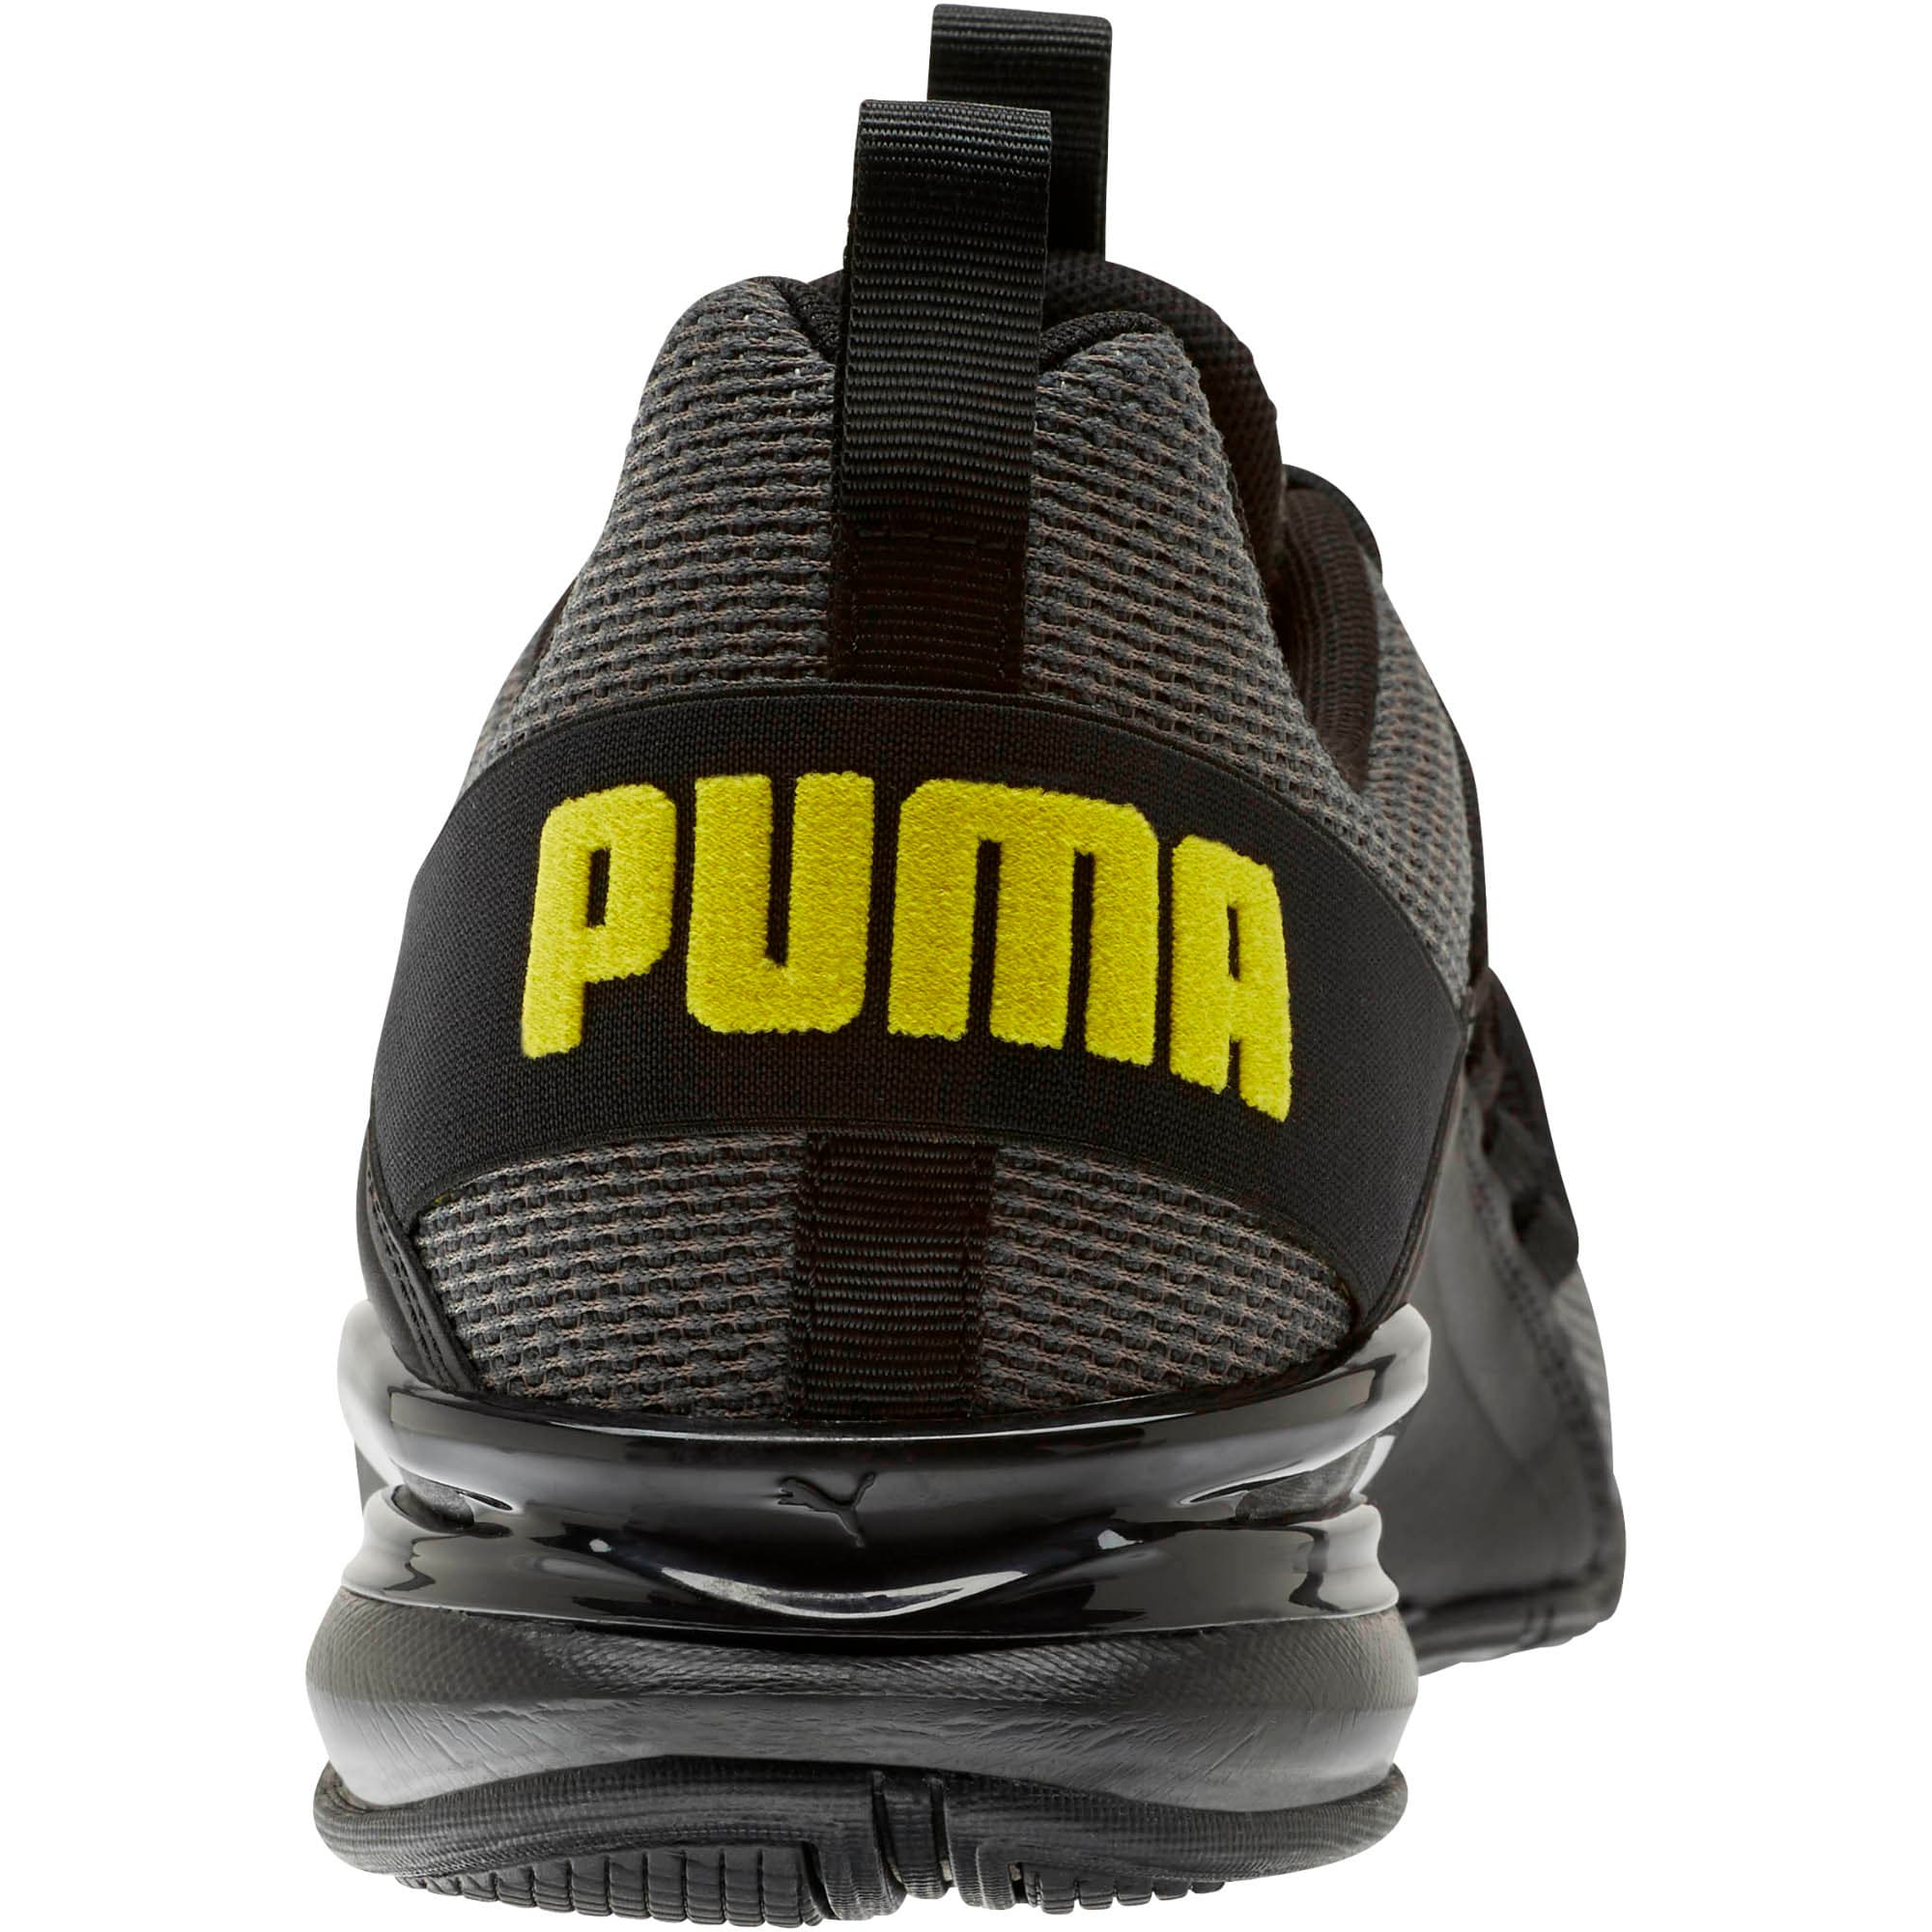 Thumbnail 3 of Axelion Mesh Men's Training Shoes, Charcoal Gray-Blazing Yellow, medium